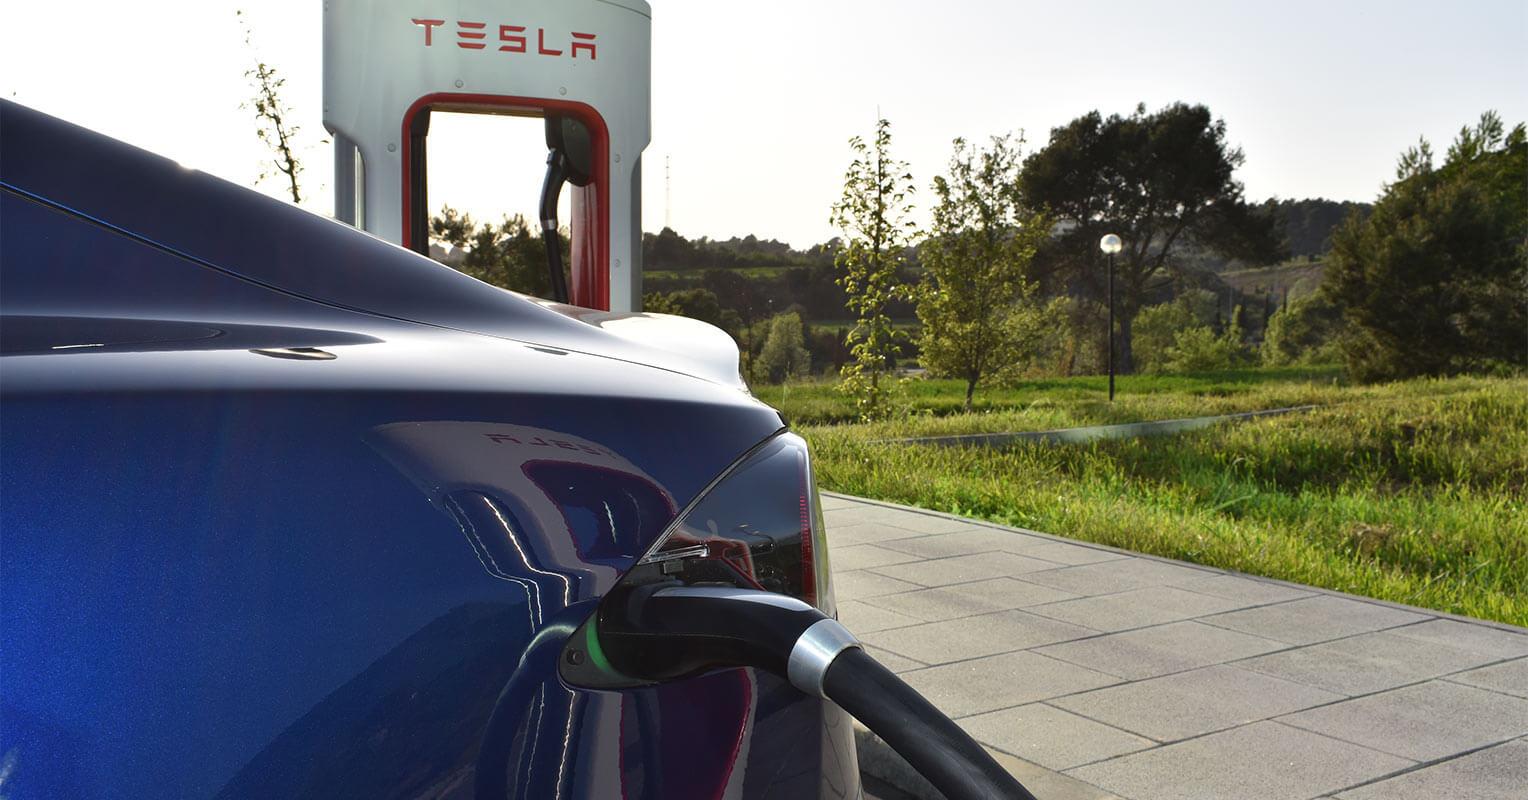 Enchufe del Tesla Model S 2018